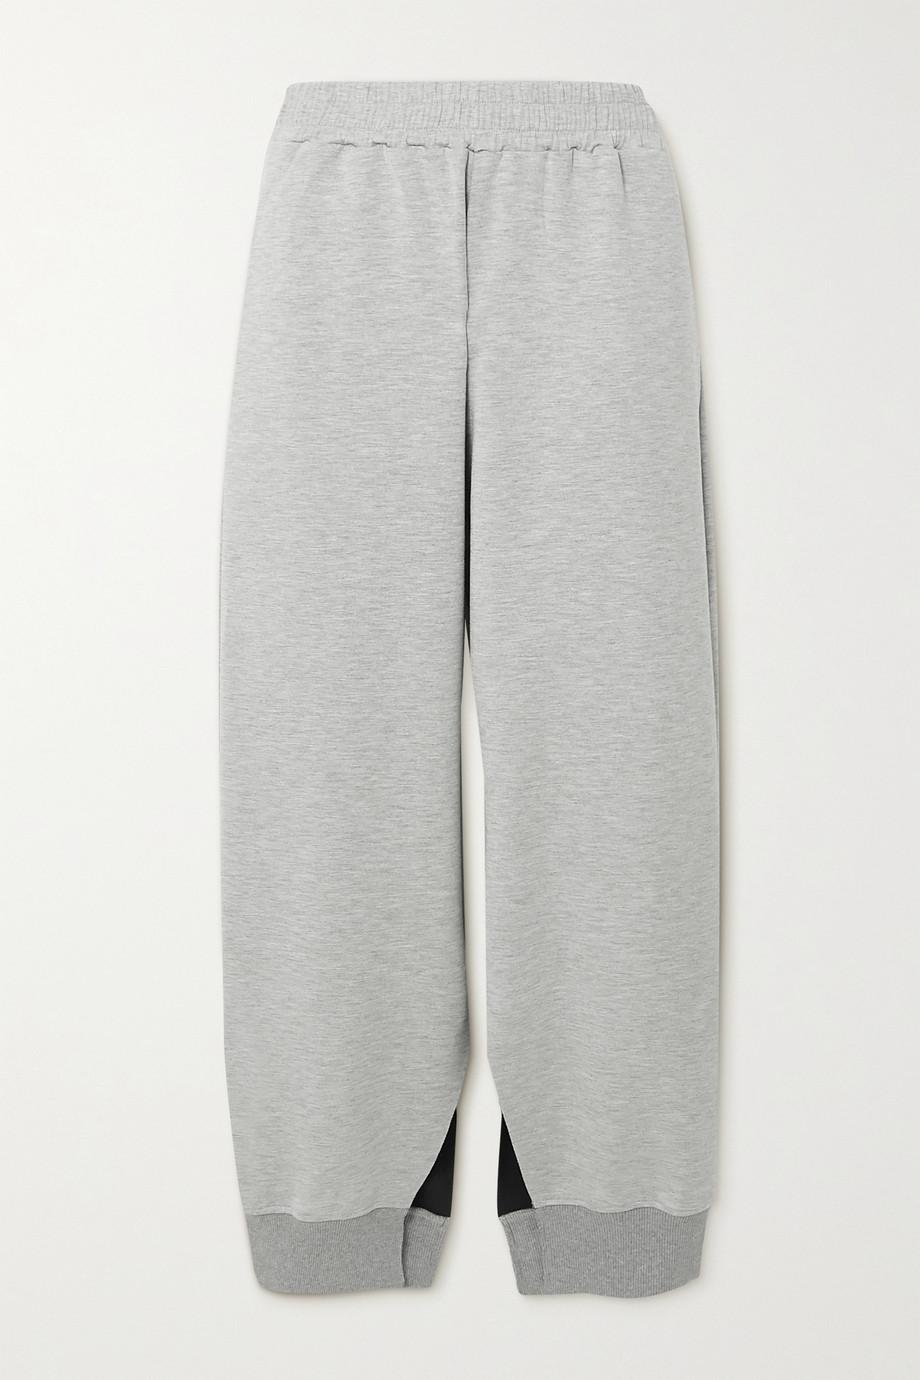 MM6 Maison Margiela 混色平纹布休闲裤